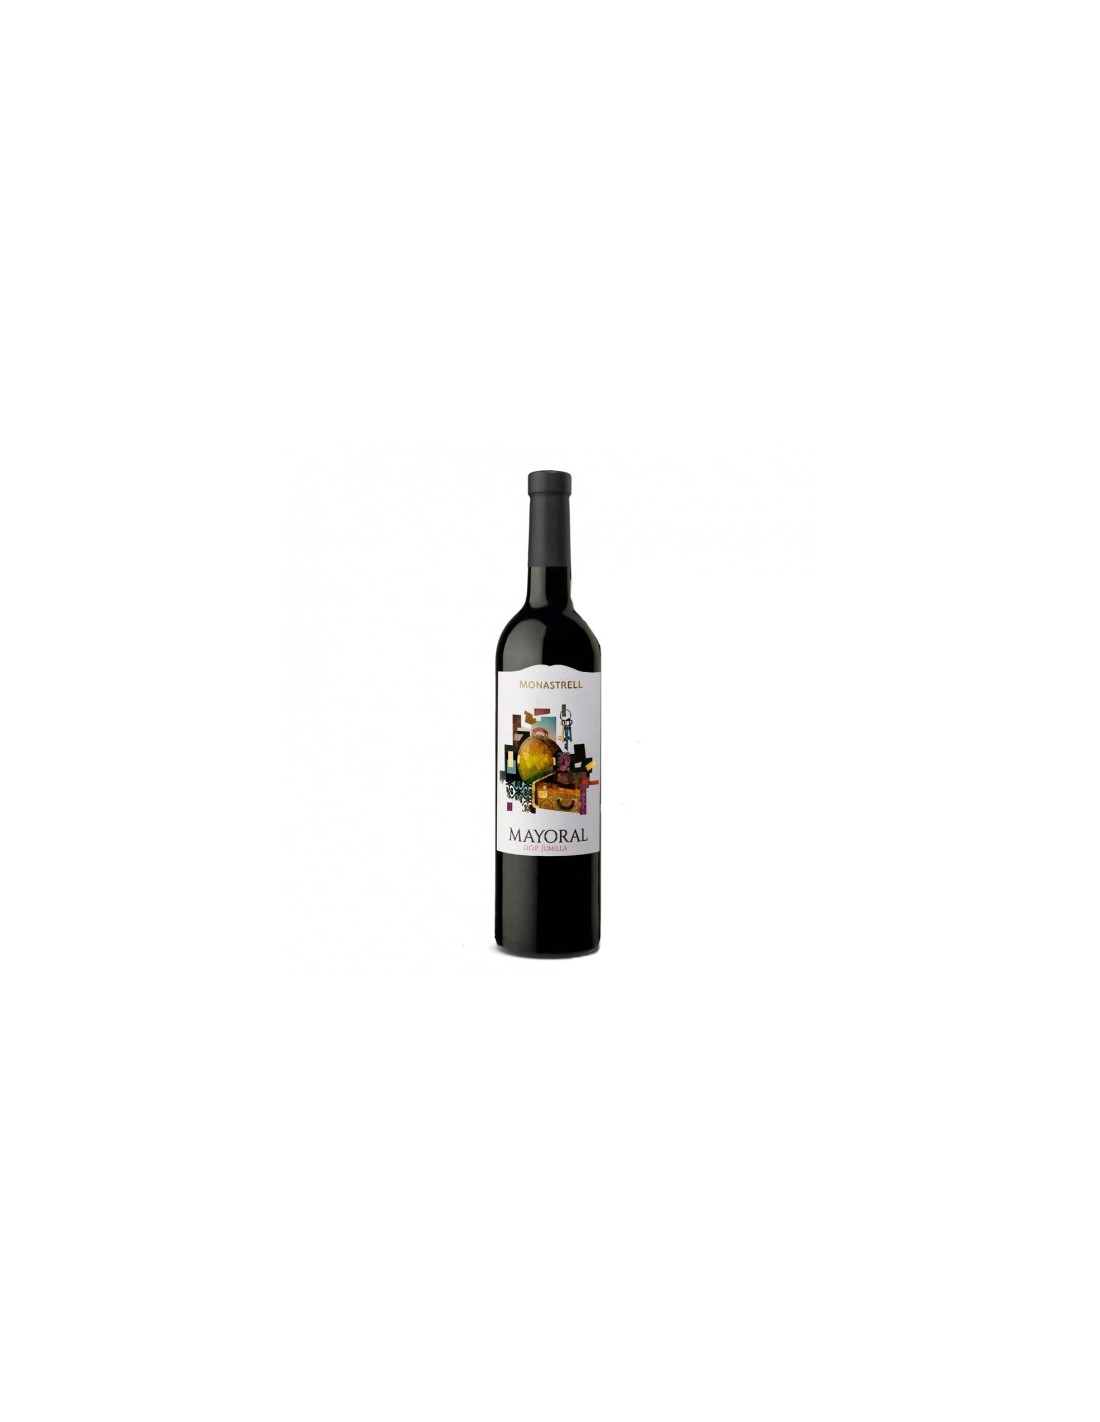 Vin rosu, Monastrell, Mayoral Jumilla, 0.75L, 14% alc., Spania